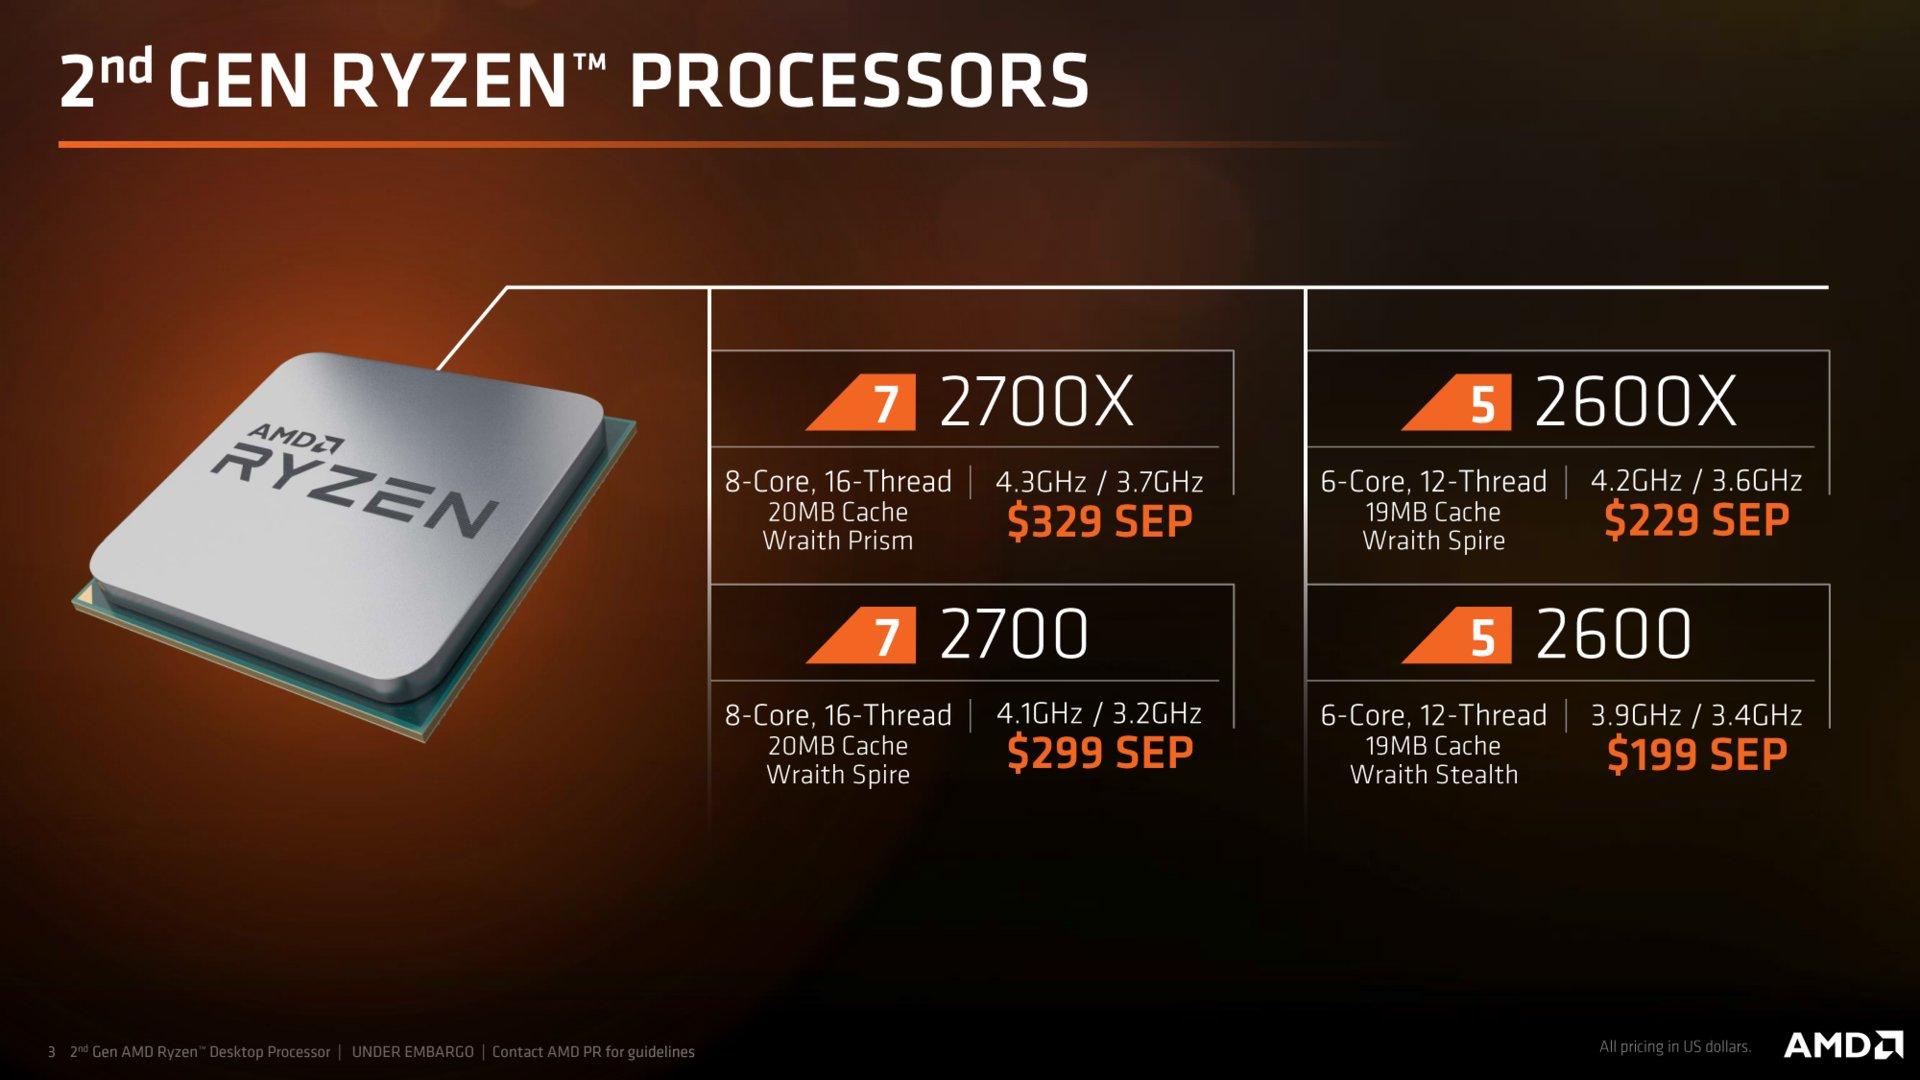 AMD Ryzen 2700 CPU Review – The Zen+ Refresh and 400-Series Platform